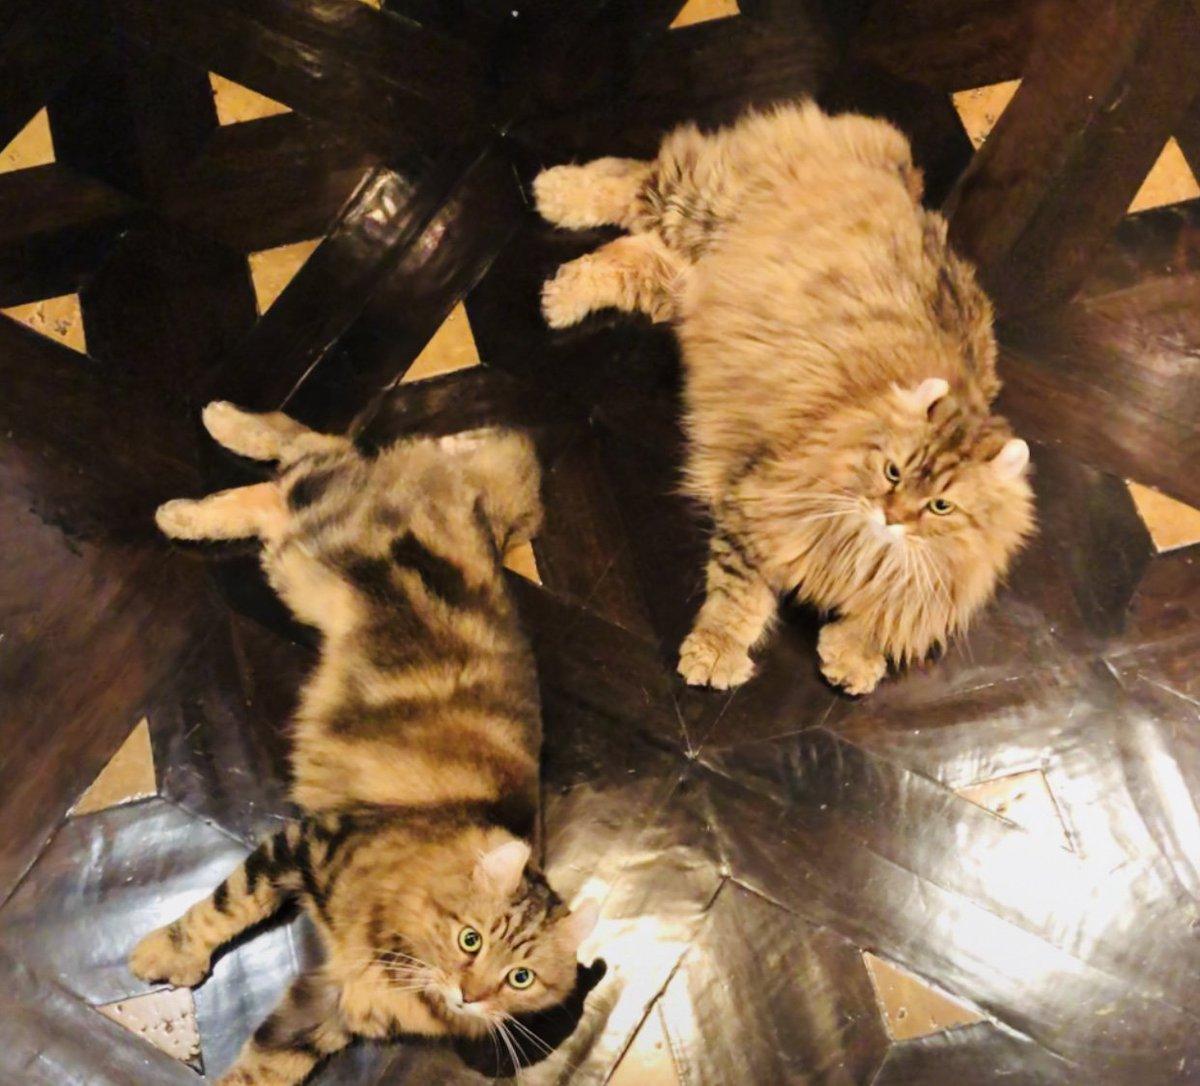 Cats on Bathroom Floor https://t.co/p0xC2M2i6V